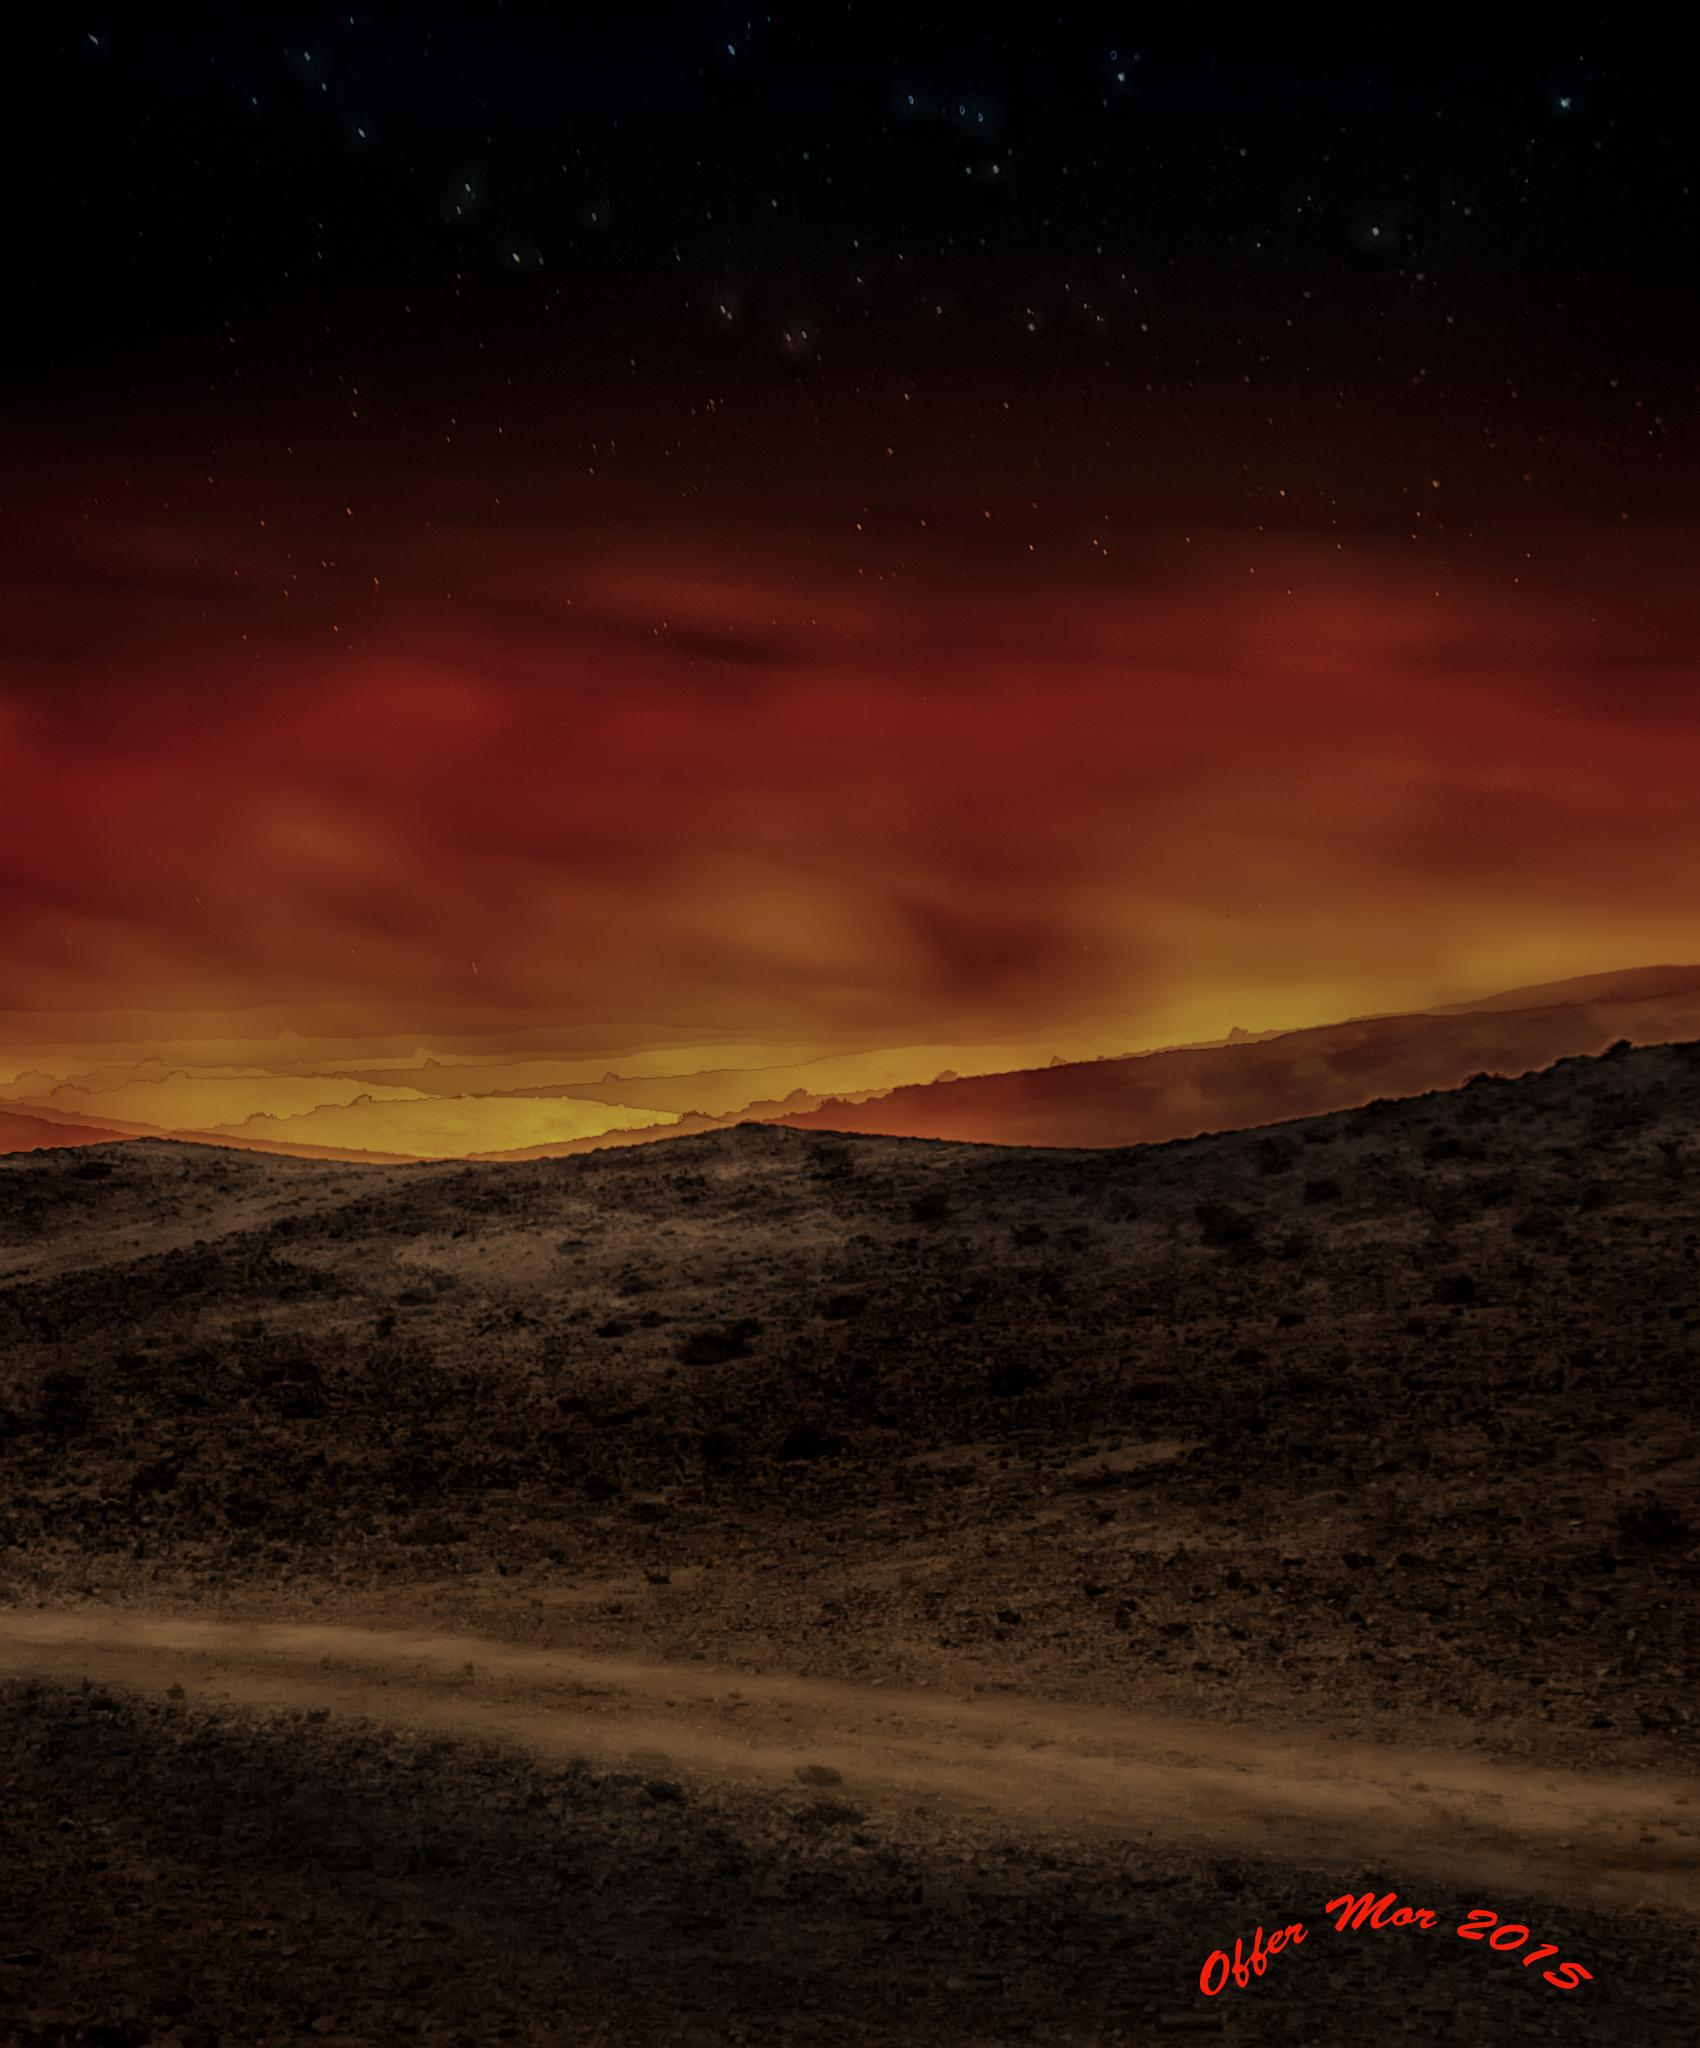 Fire in the Sky by offermor